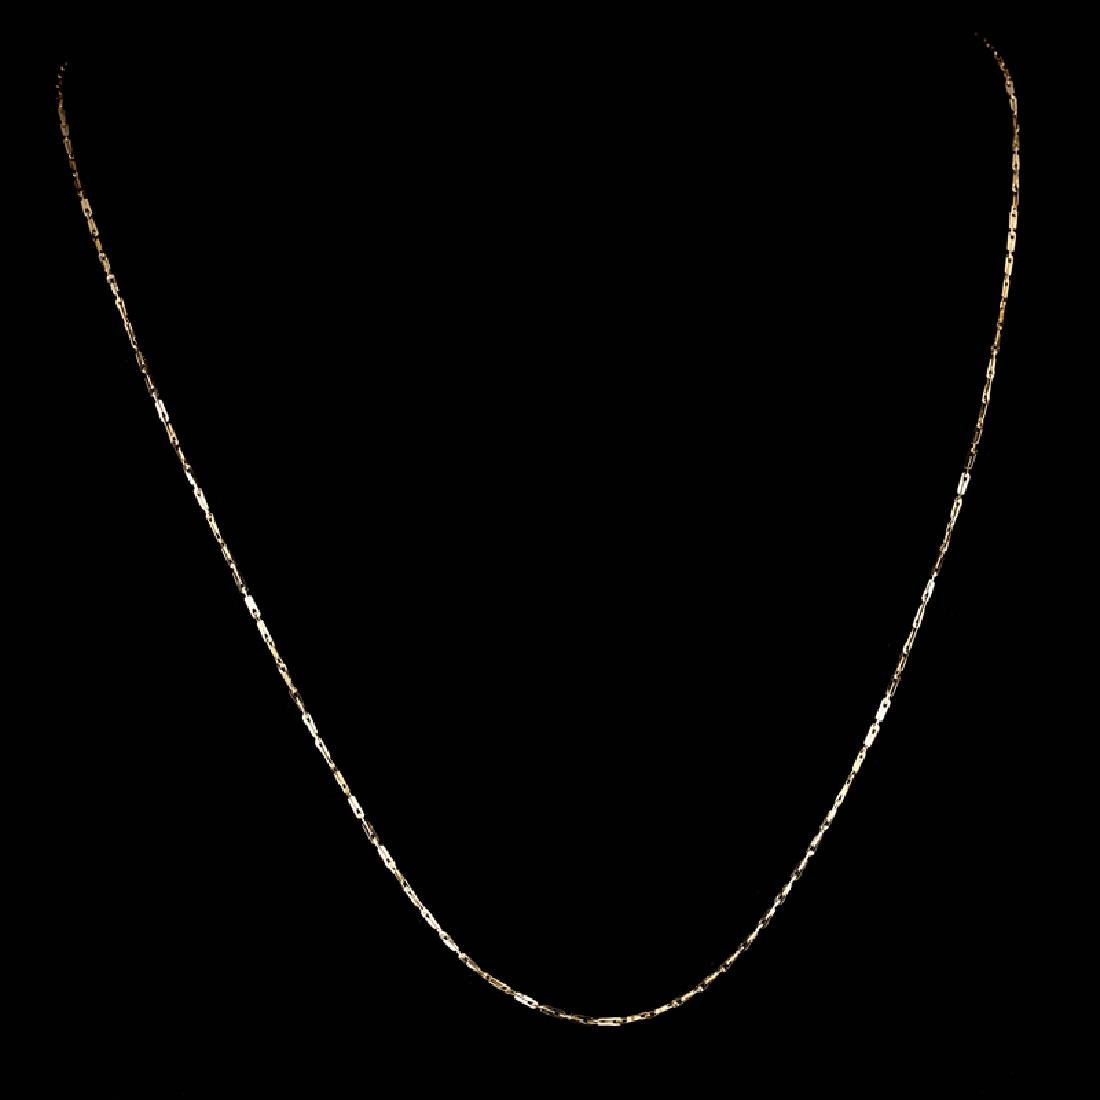 *Fine Jewelry 14 KT Gold, Pinsetta 1.1GM, 18'' Chain